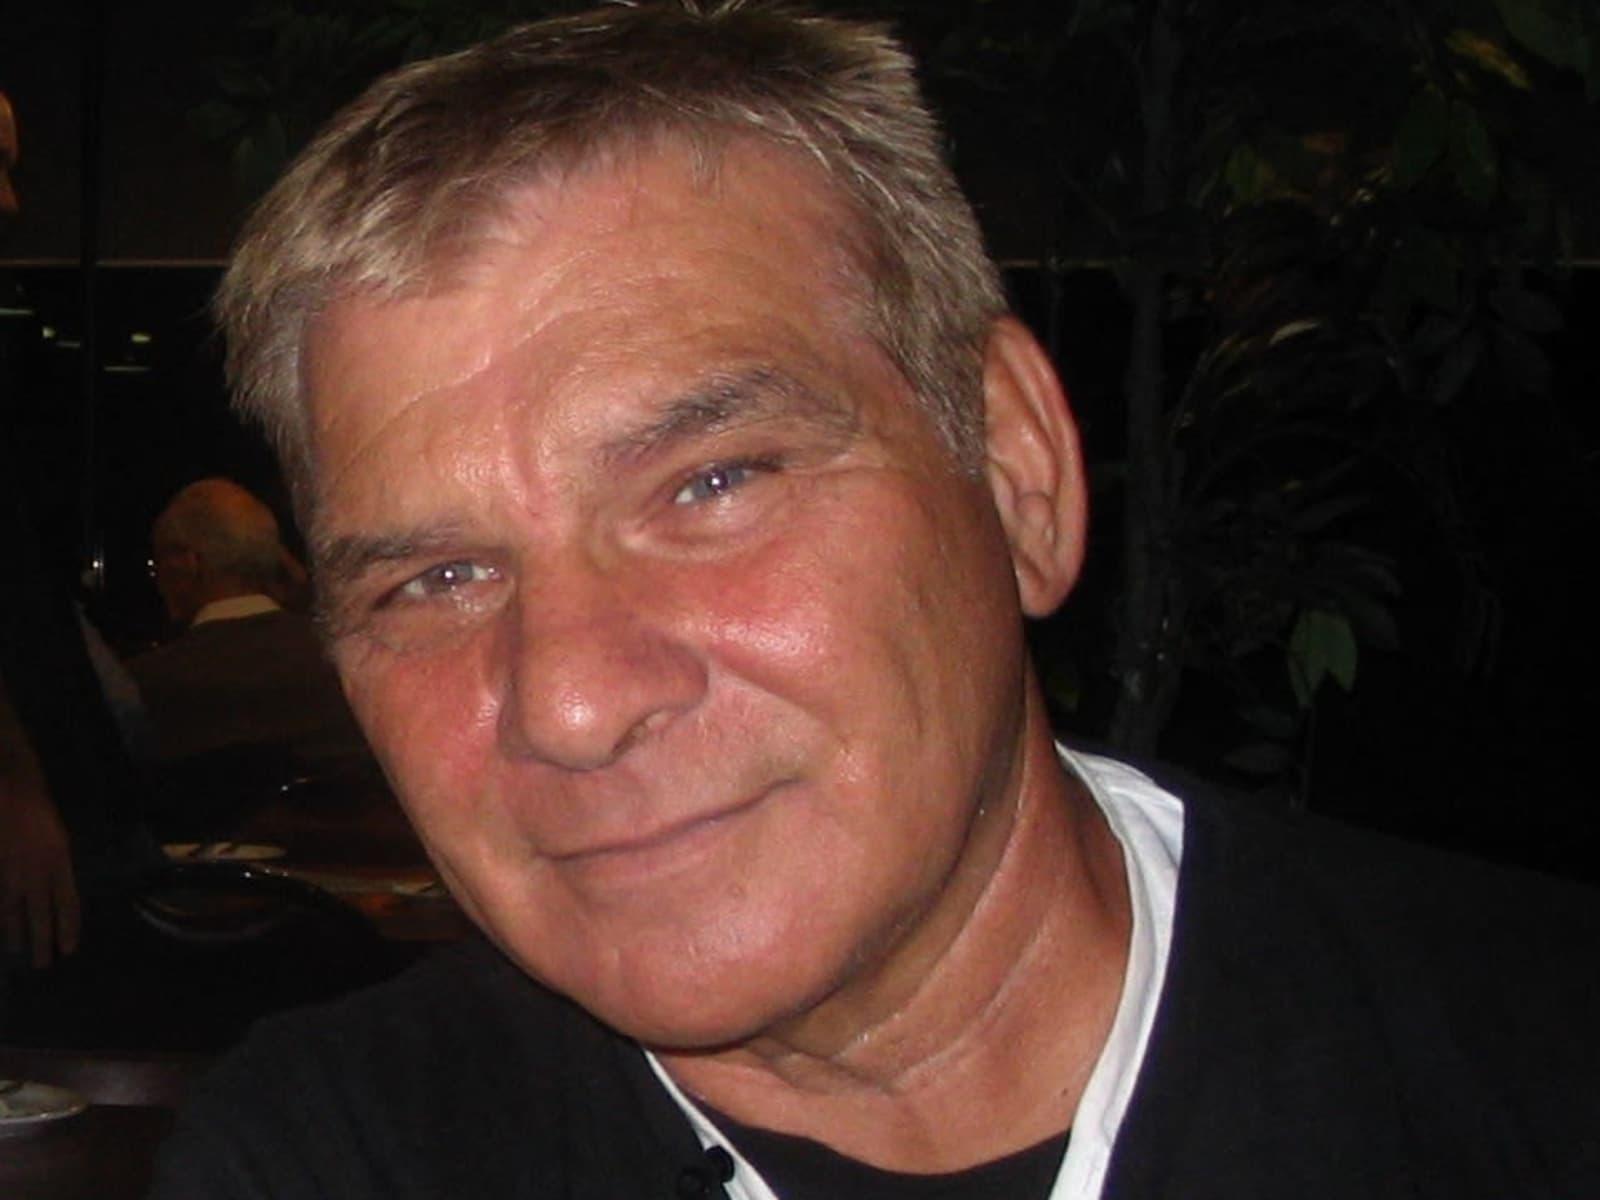 Frank from Gold Coast, Queensland, Australia